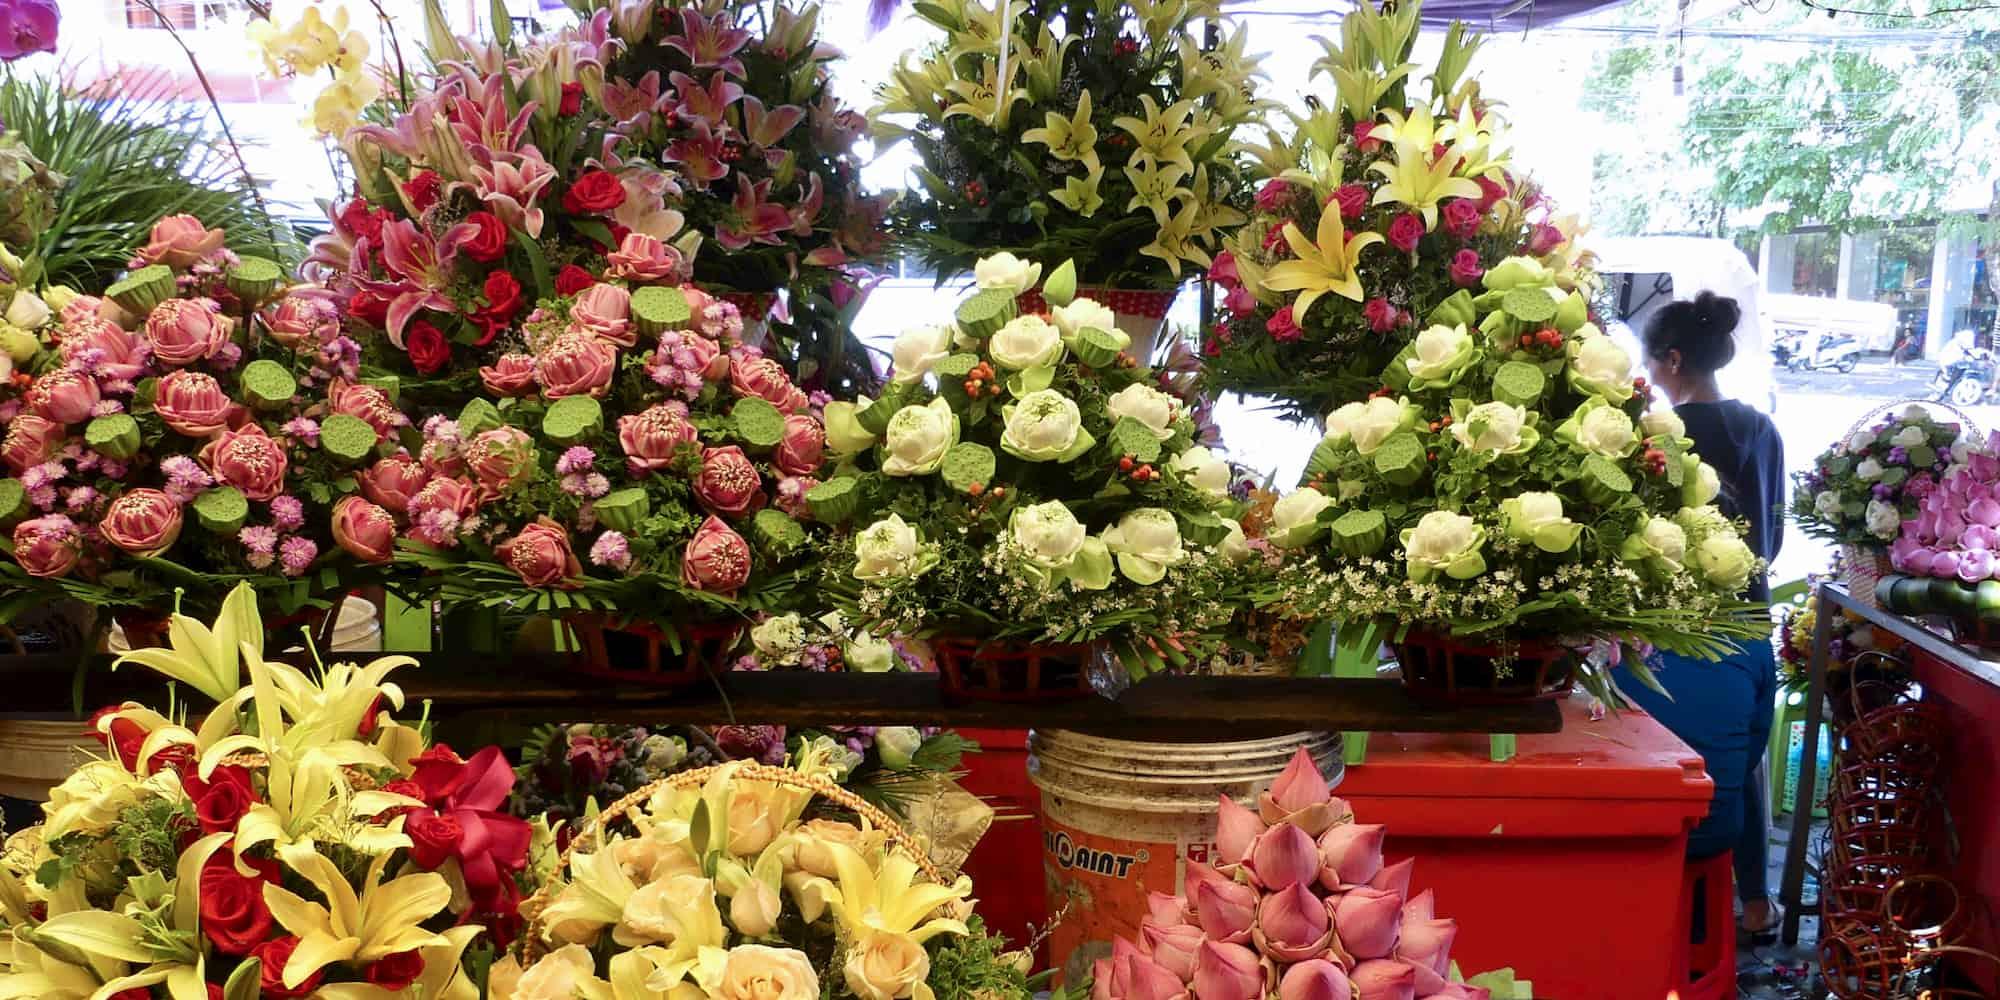 market of flowers